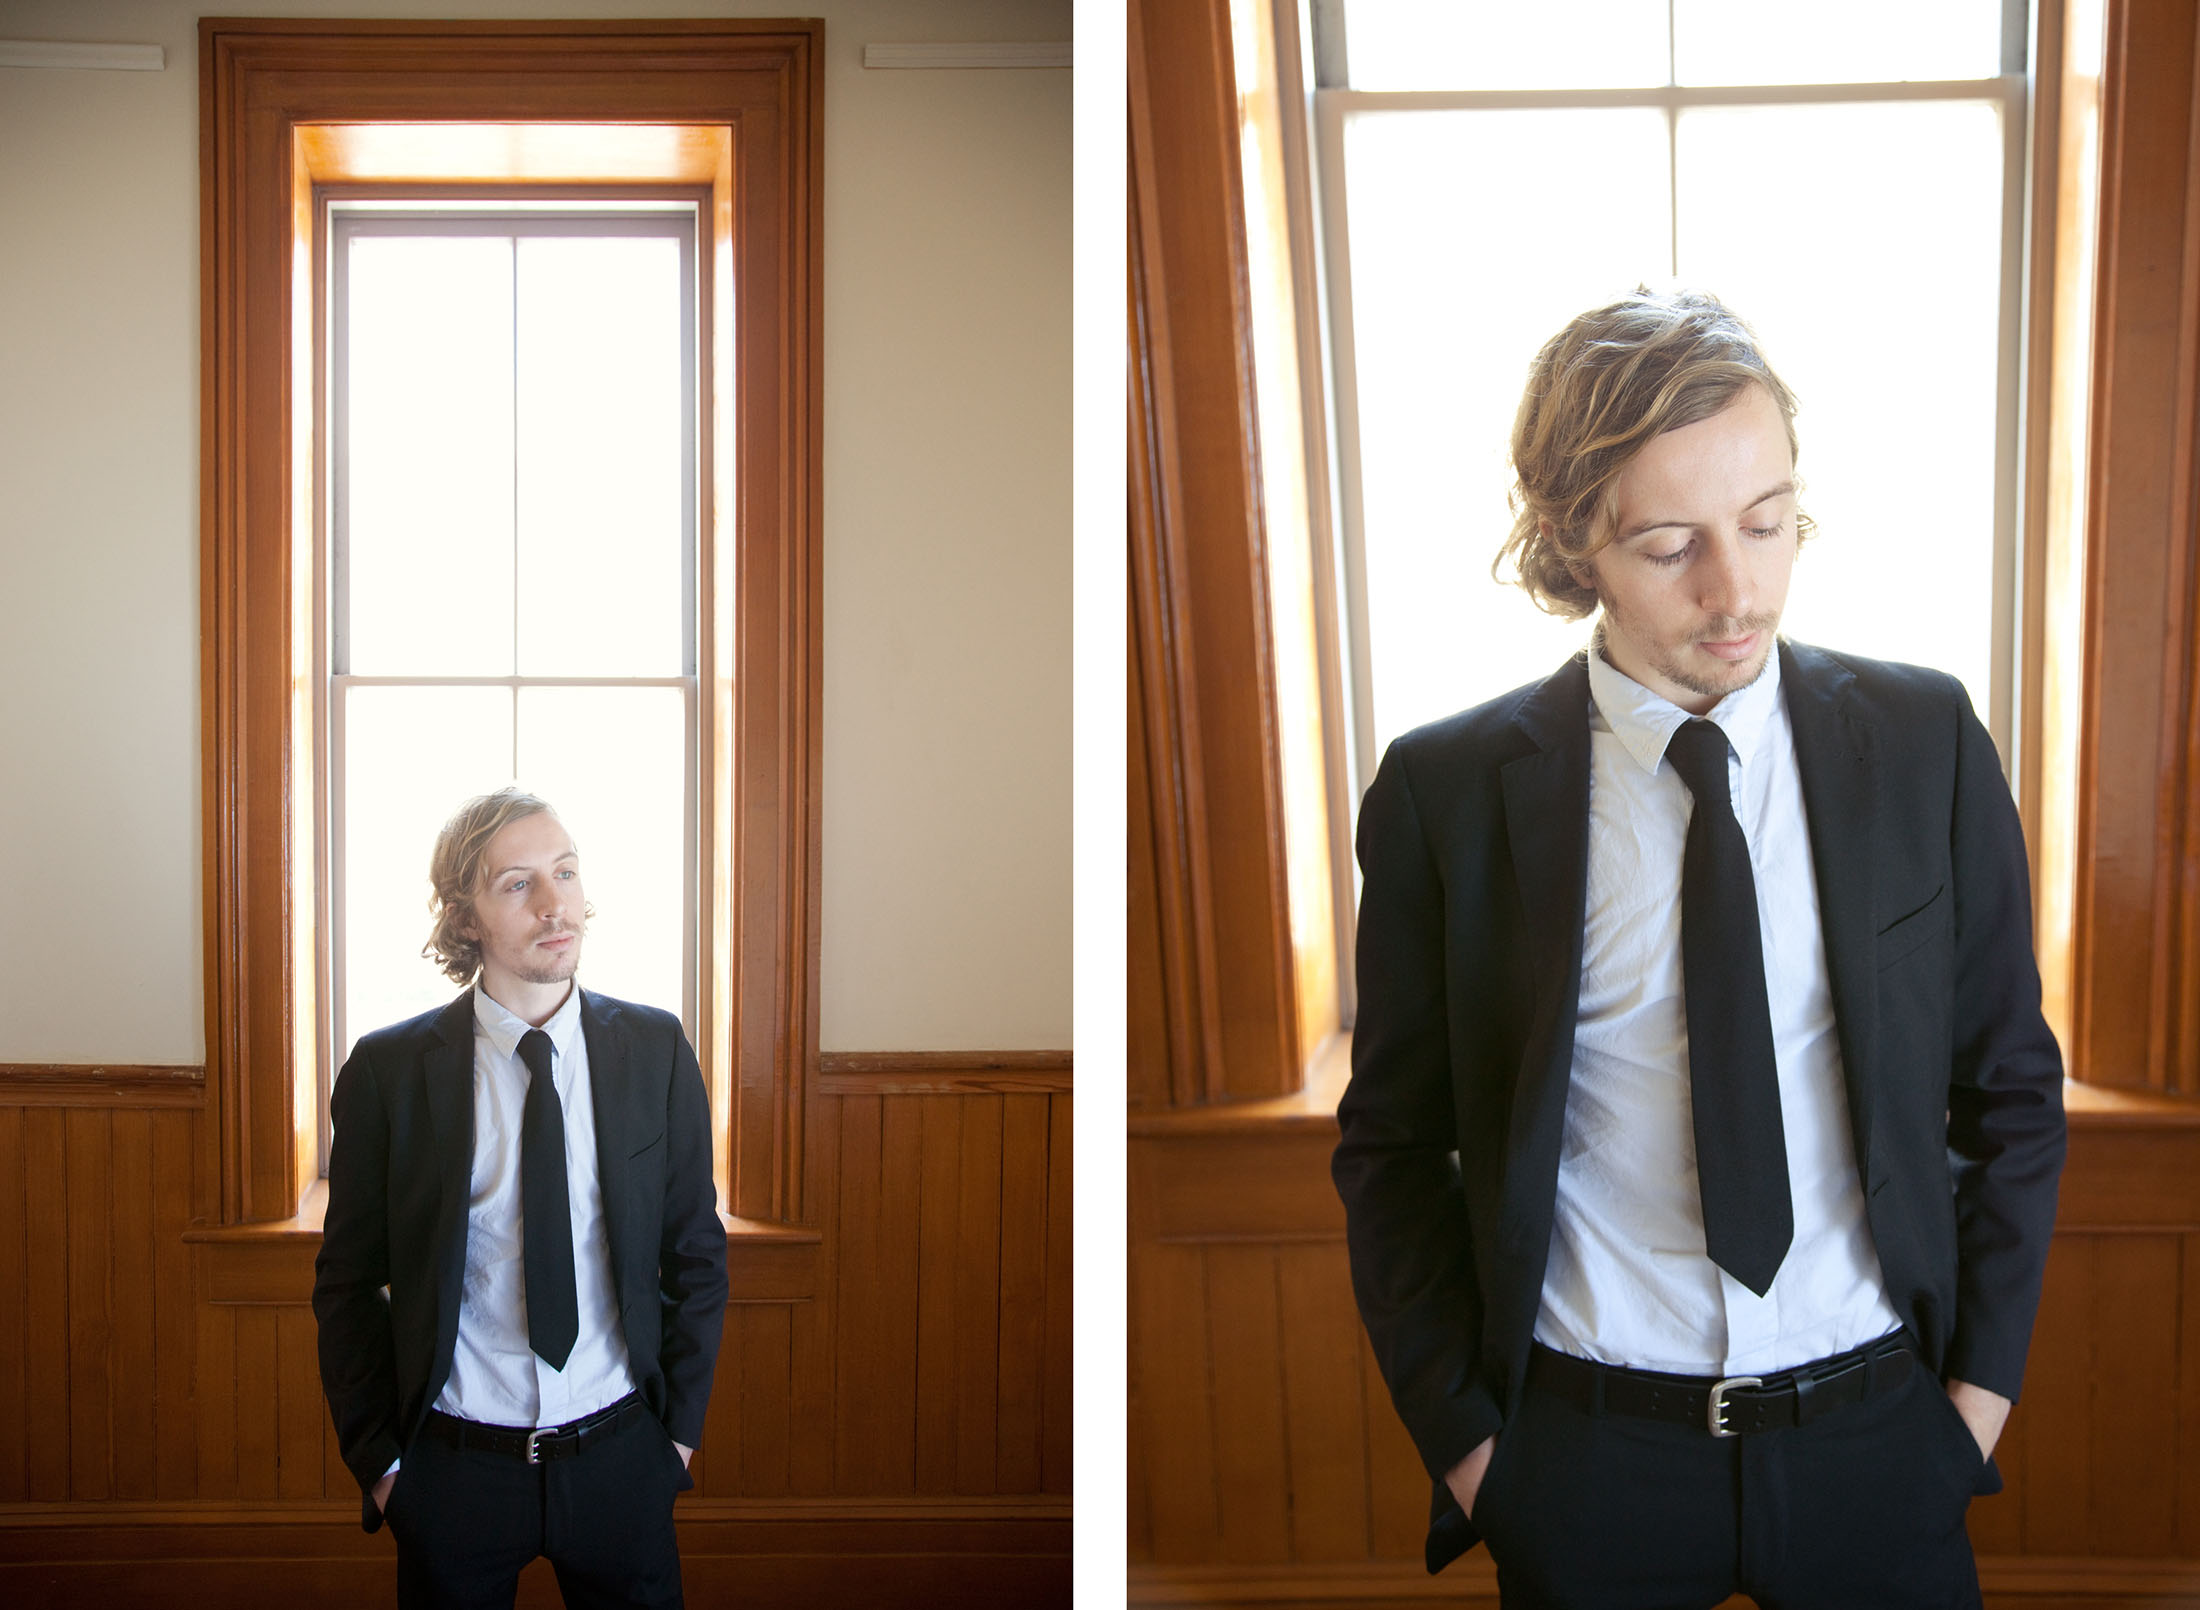 Portraits_23.jpg